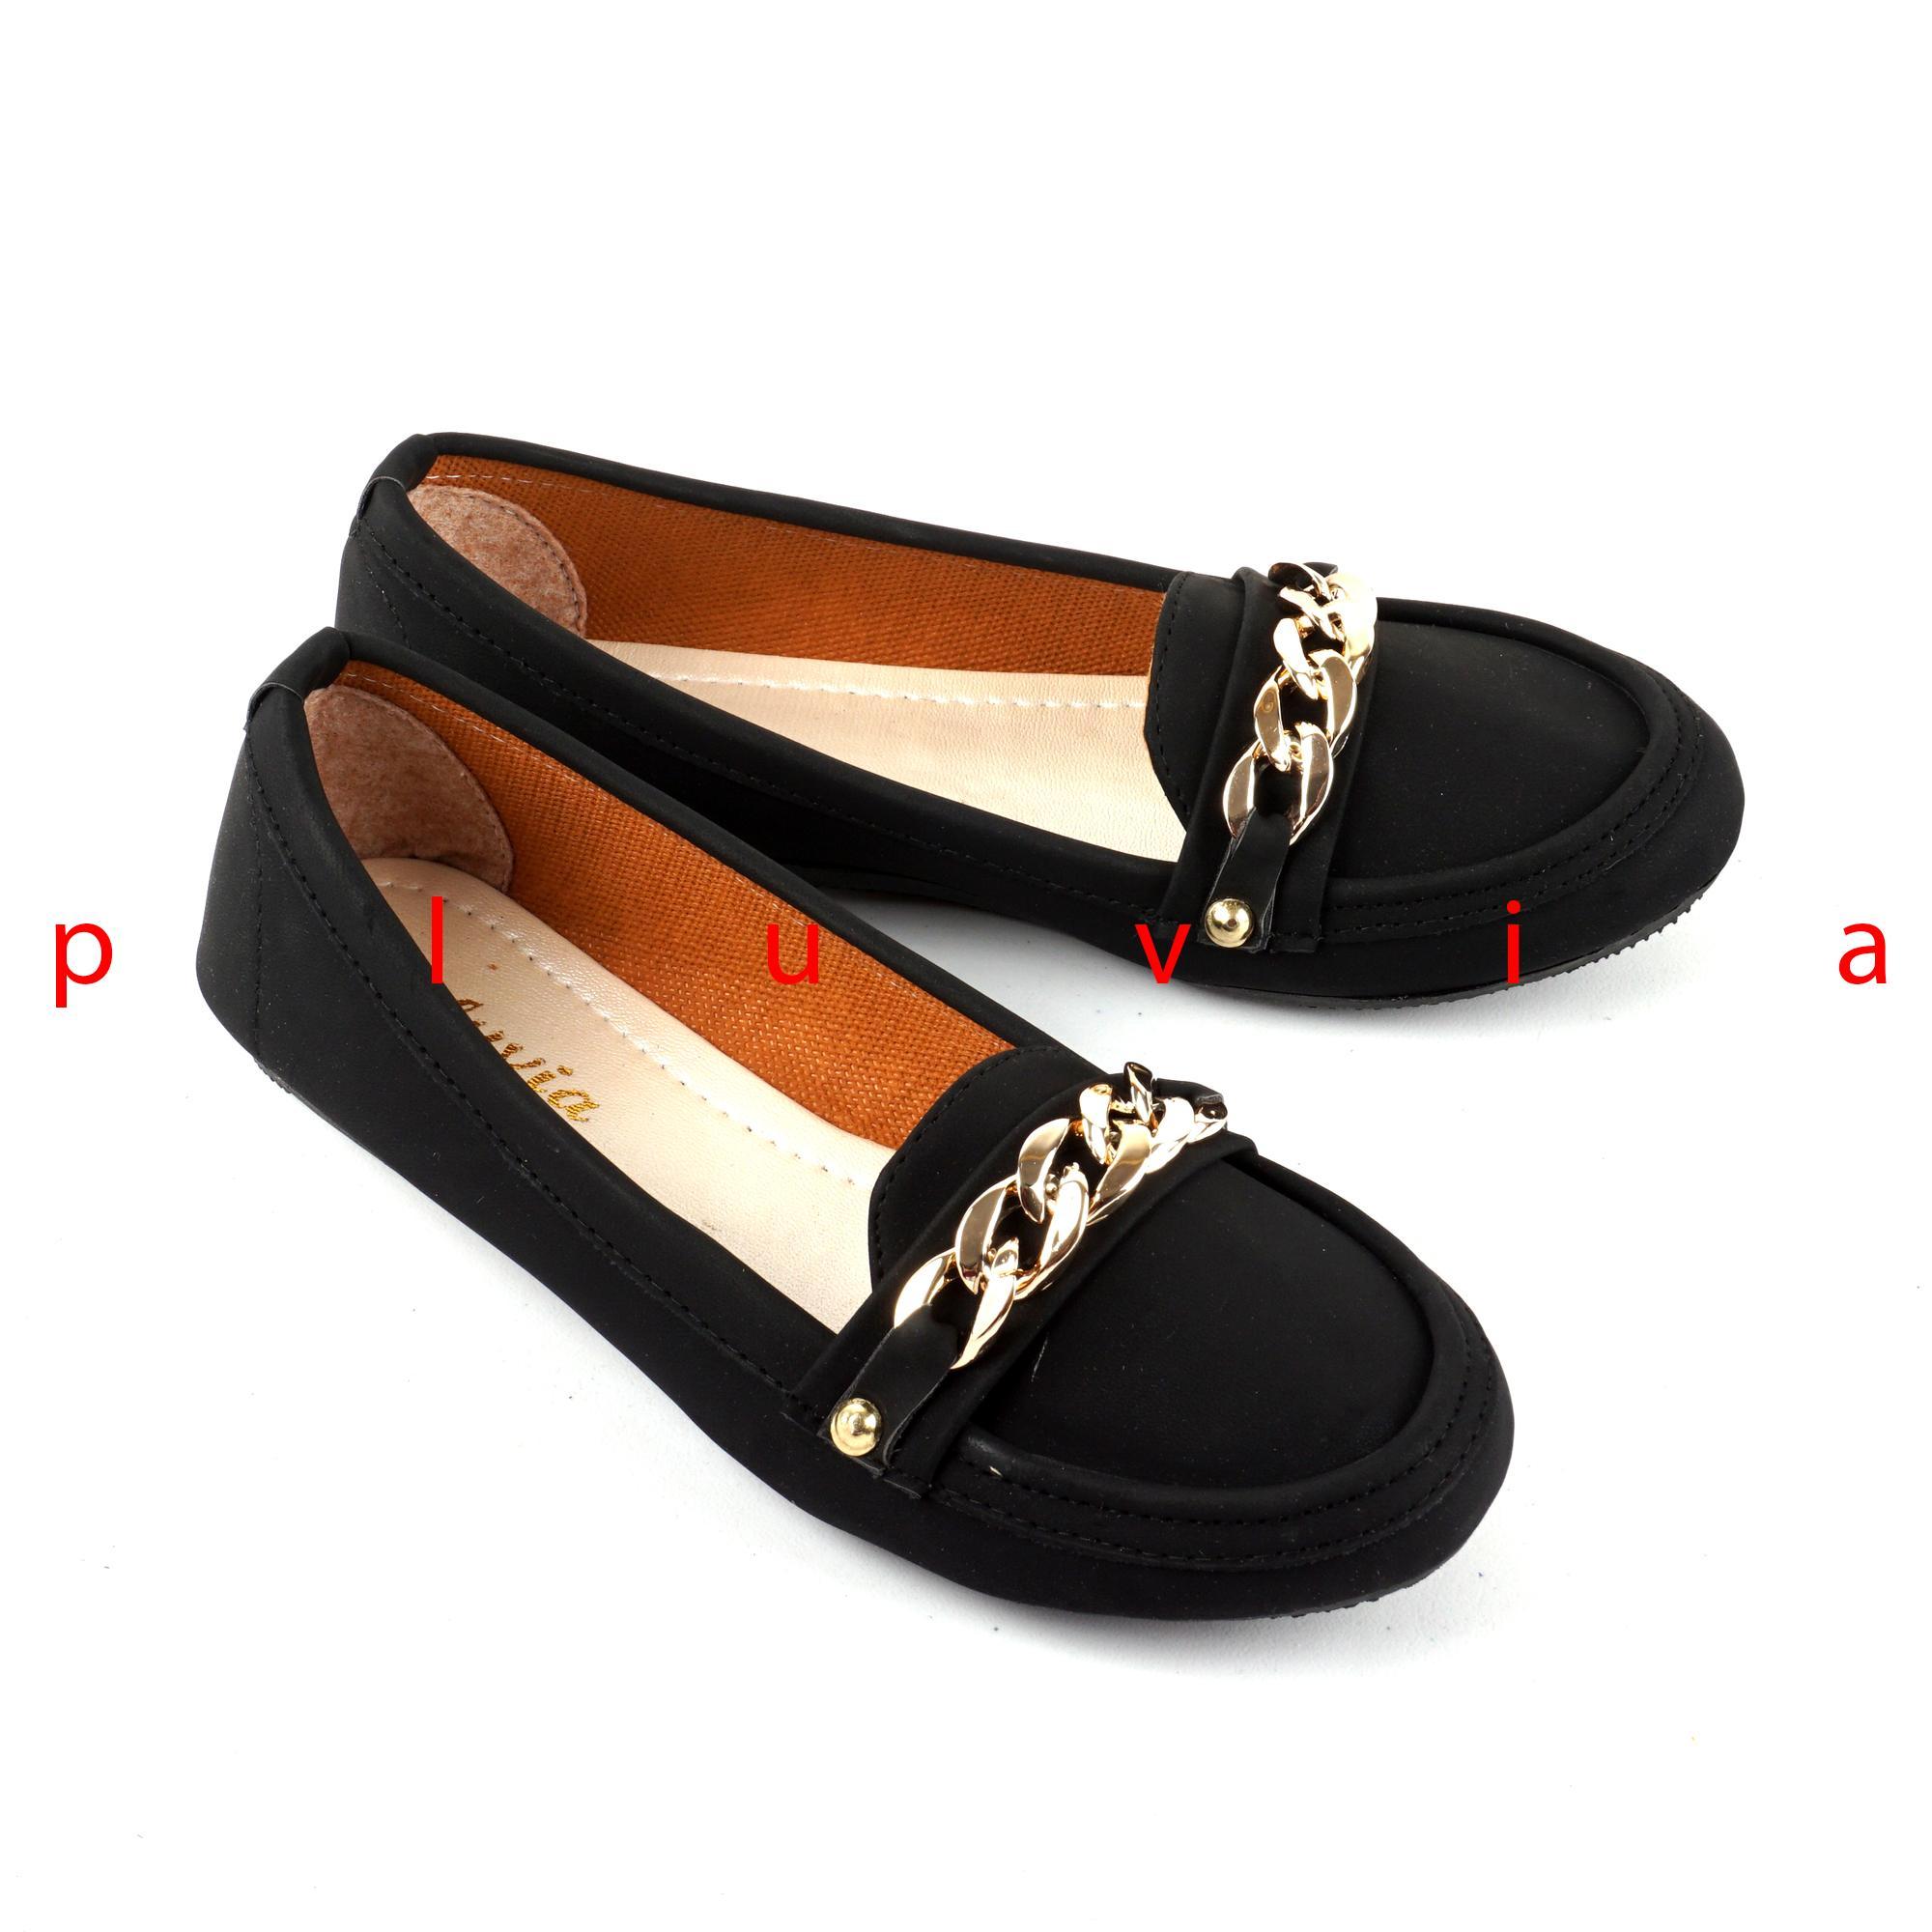 Pluvia - Sepatu Balet Flat Shoes Slip On Wanita PLV12 - Hitam 22cb2d87be